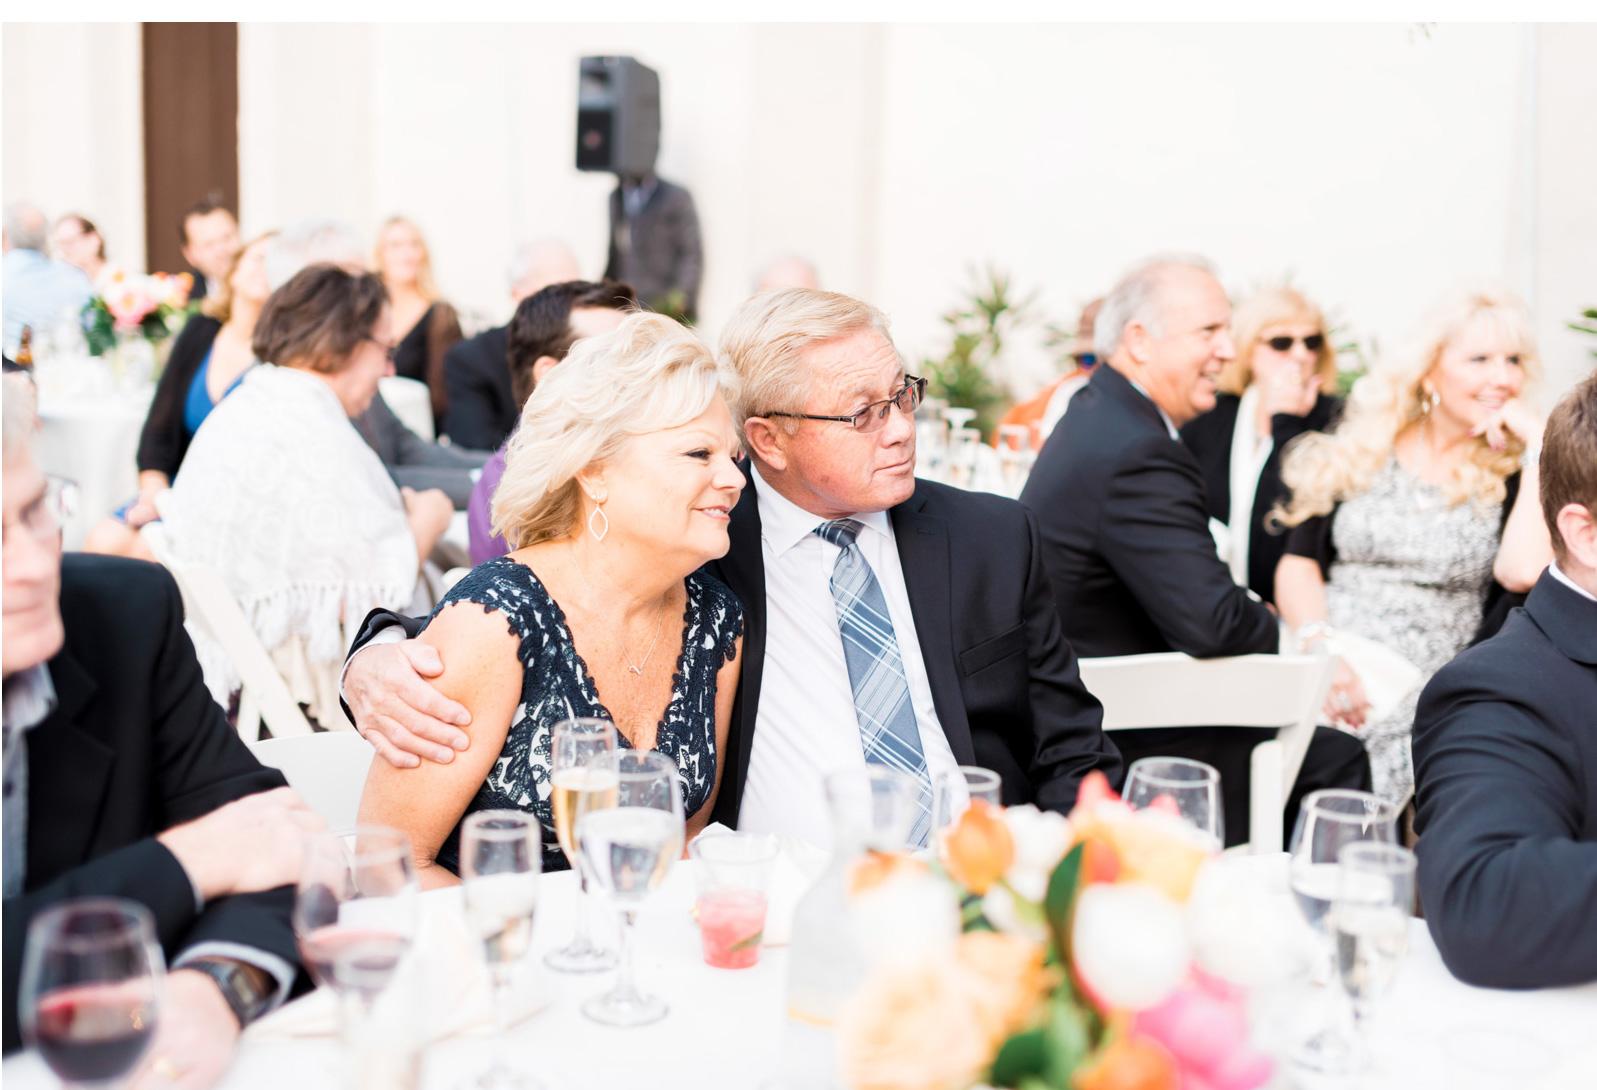 Southern-California-Santa-Barbara-Wedding-Photographer-Natalie-Schutt-Photography_34.jpg